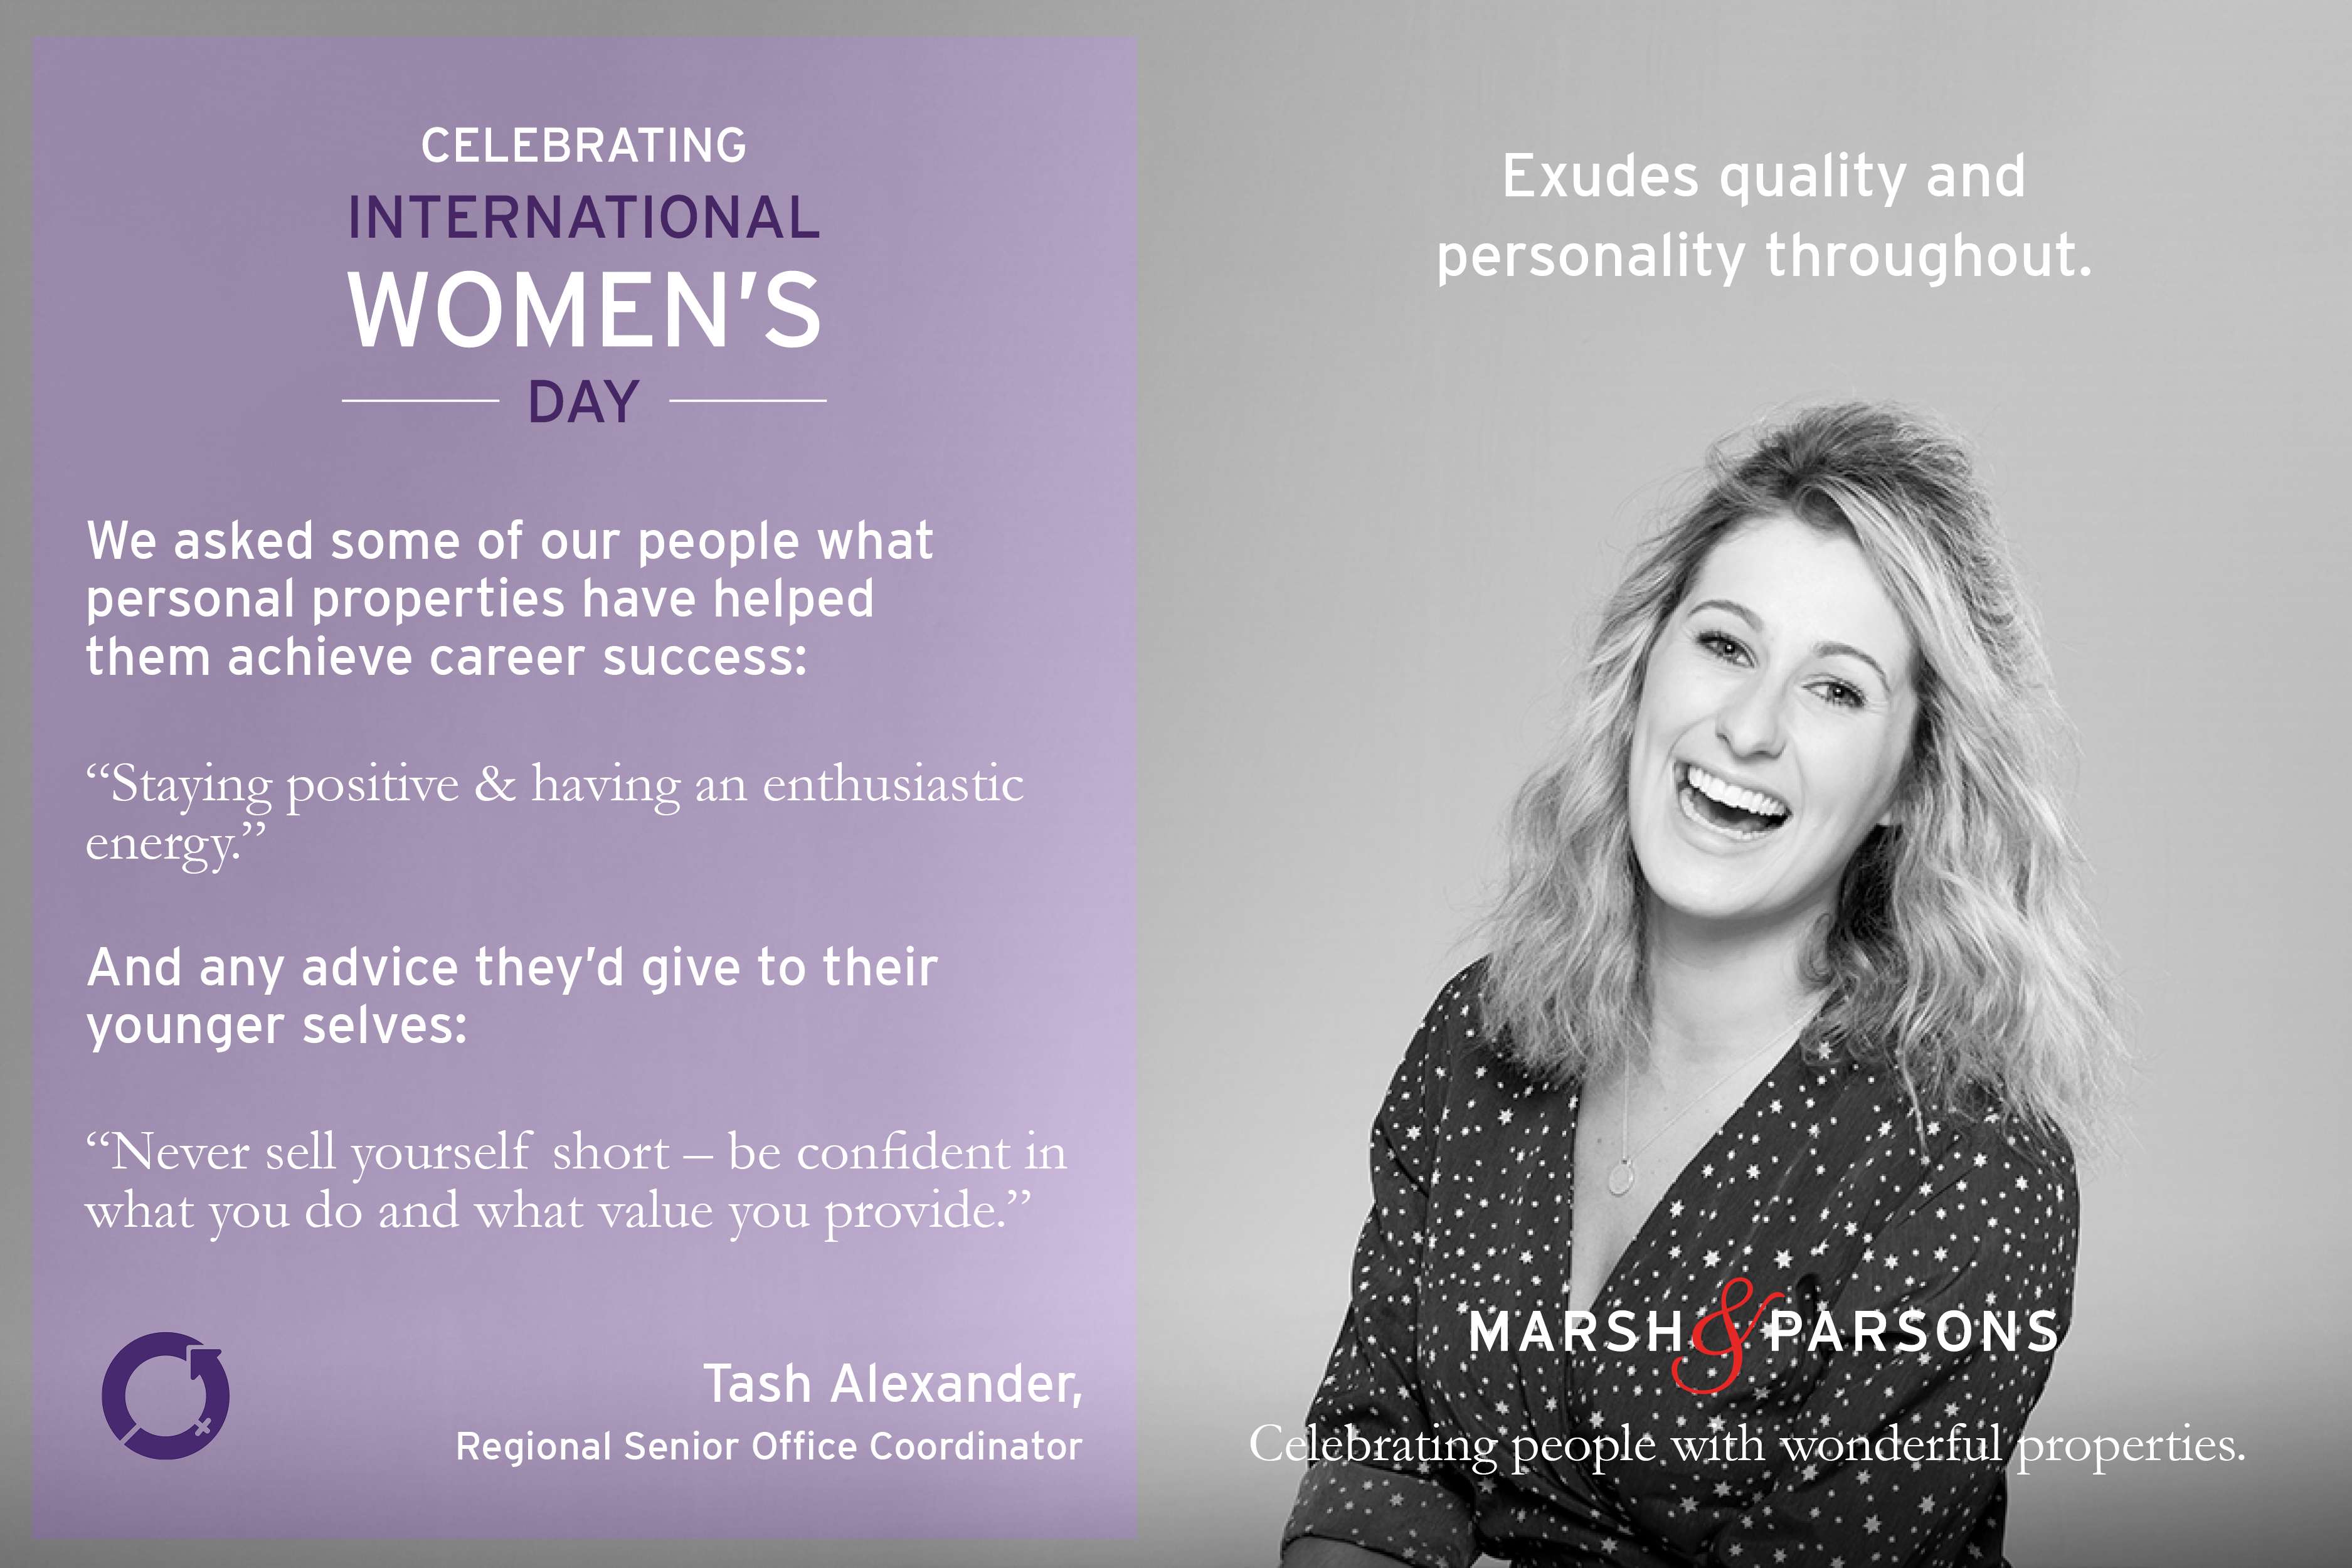 Tash Alexander, International Women's Day